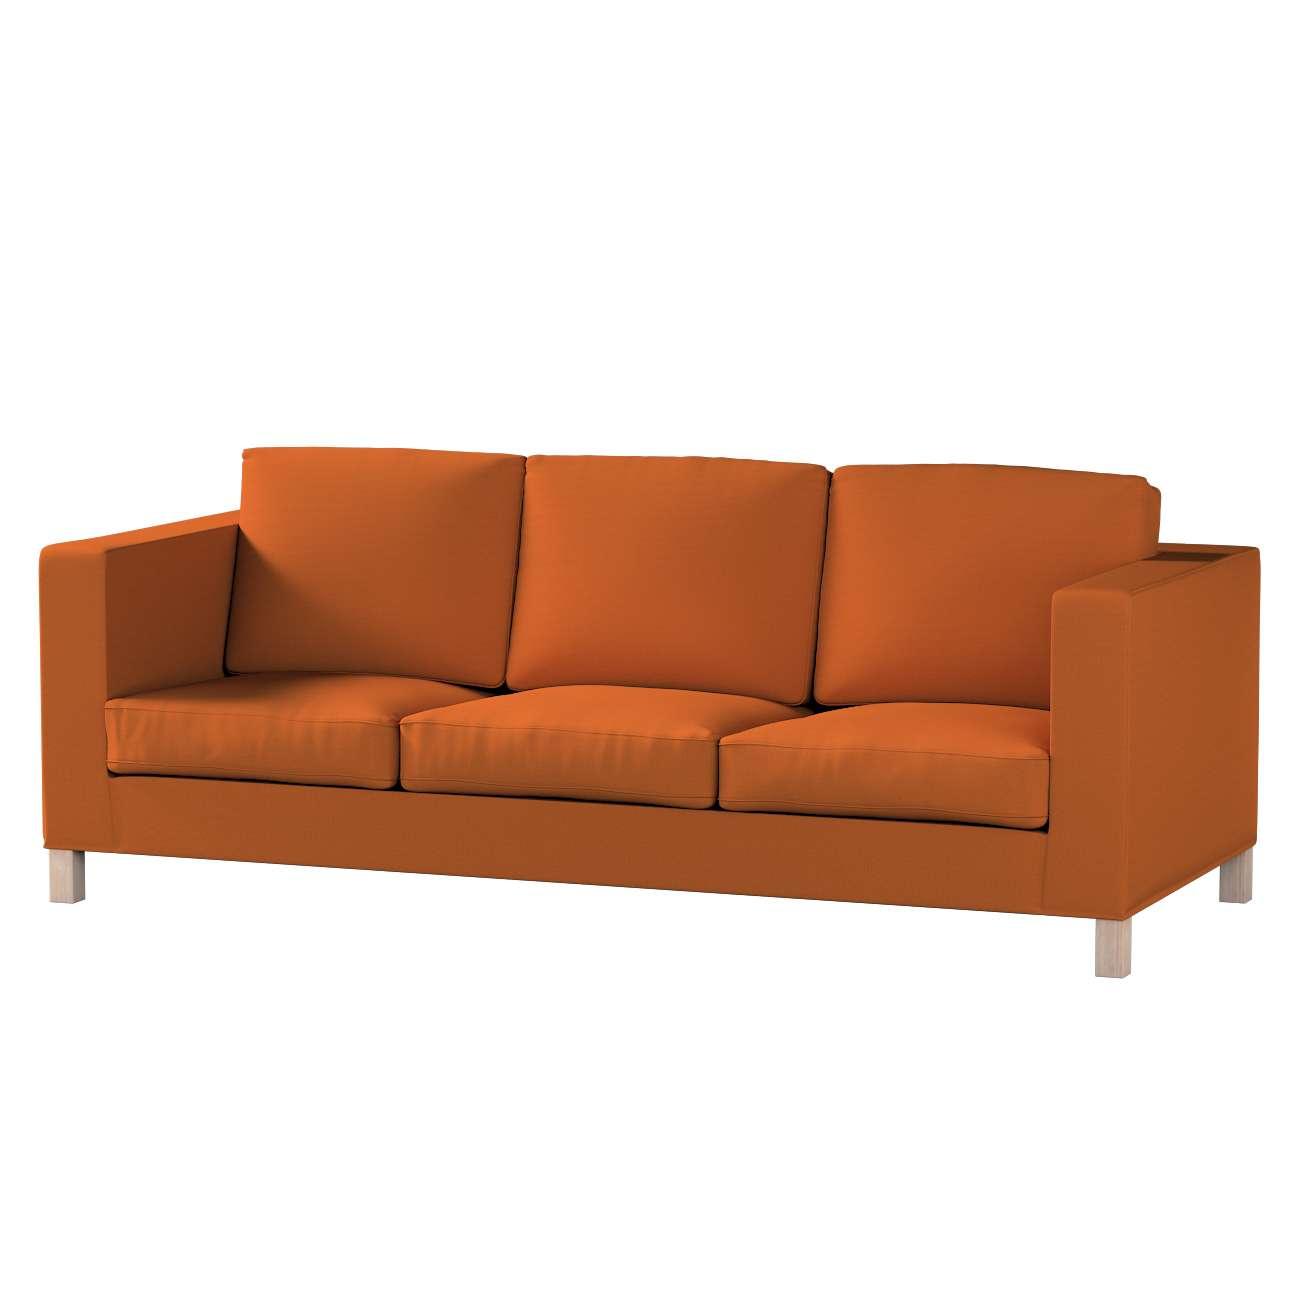 Karlanda klädsel <br>3-sits soffa - kort klädsel i kollektionen Panama Cotton, Tyg: 702-42